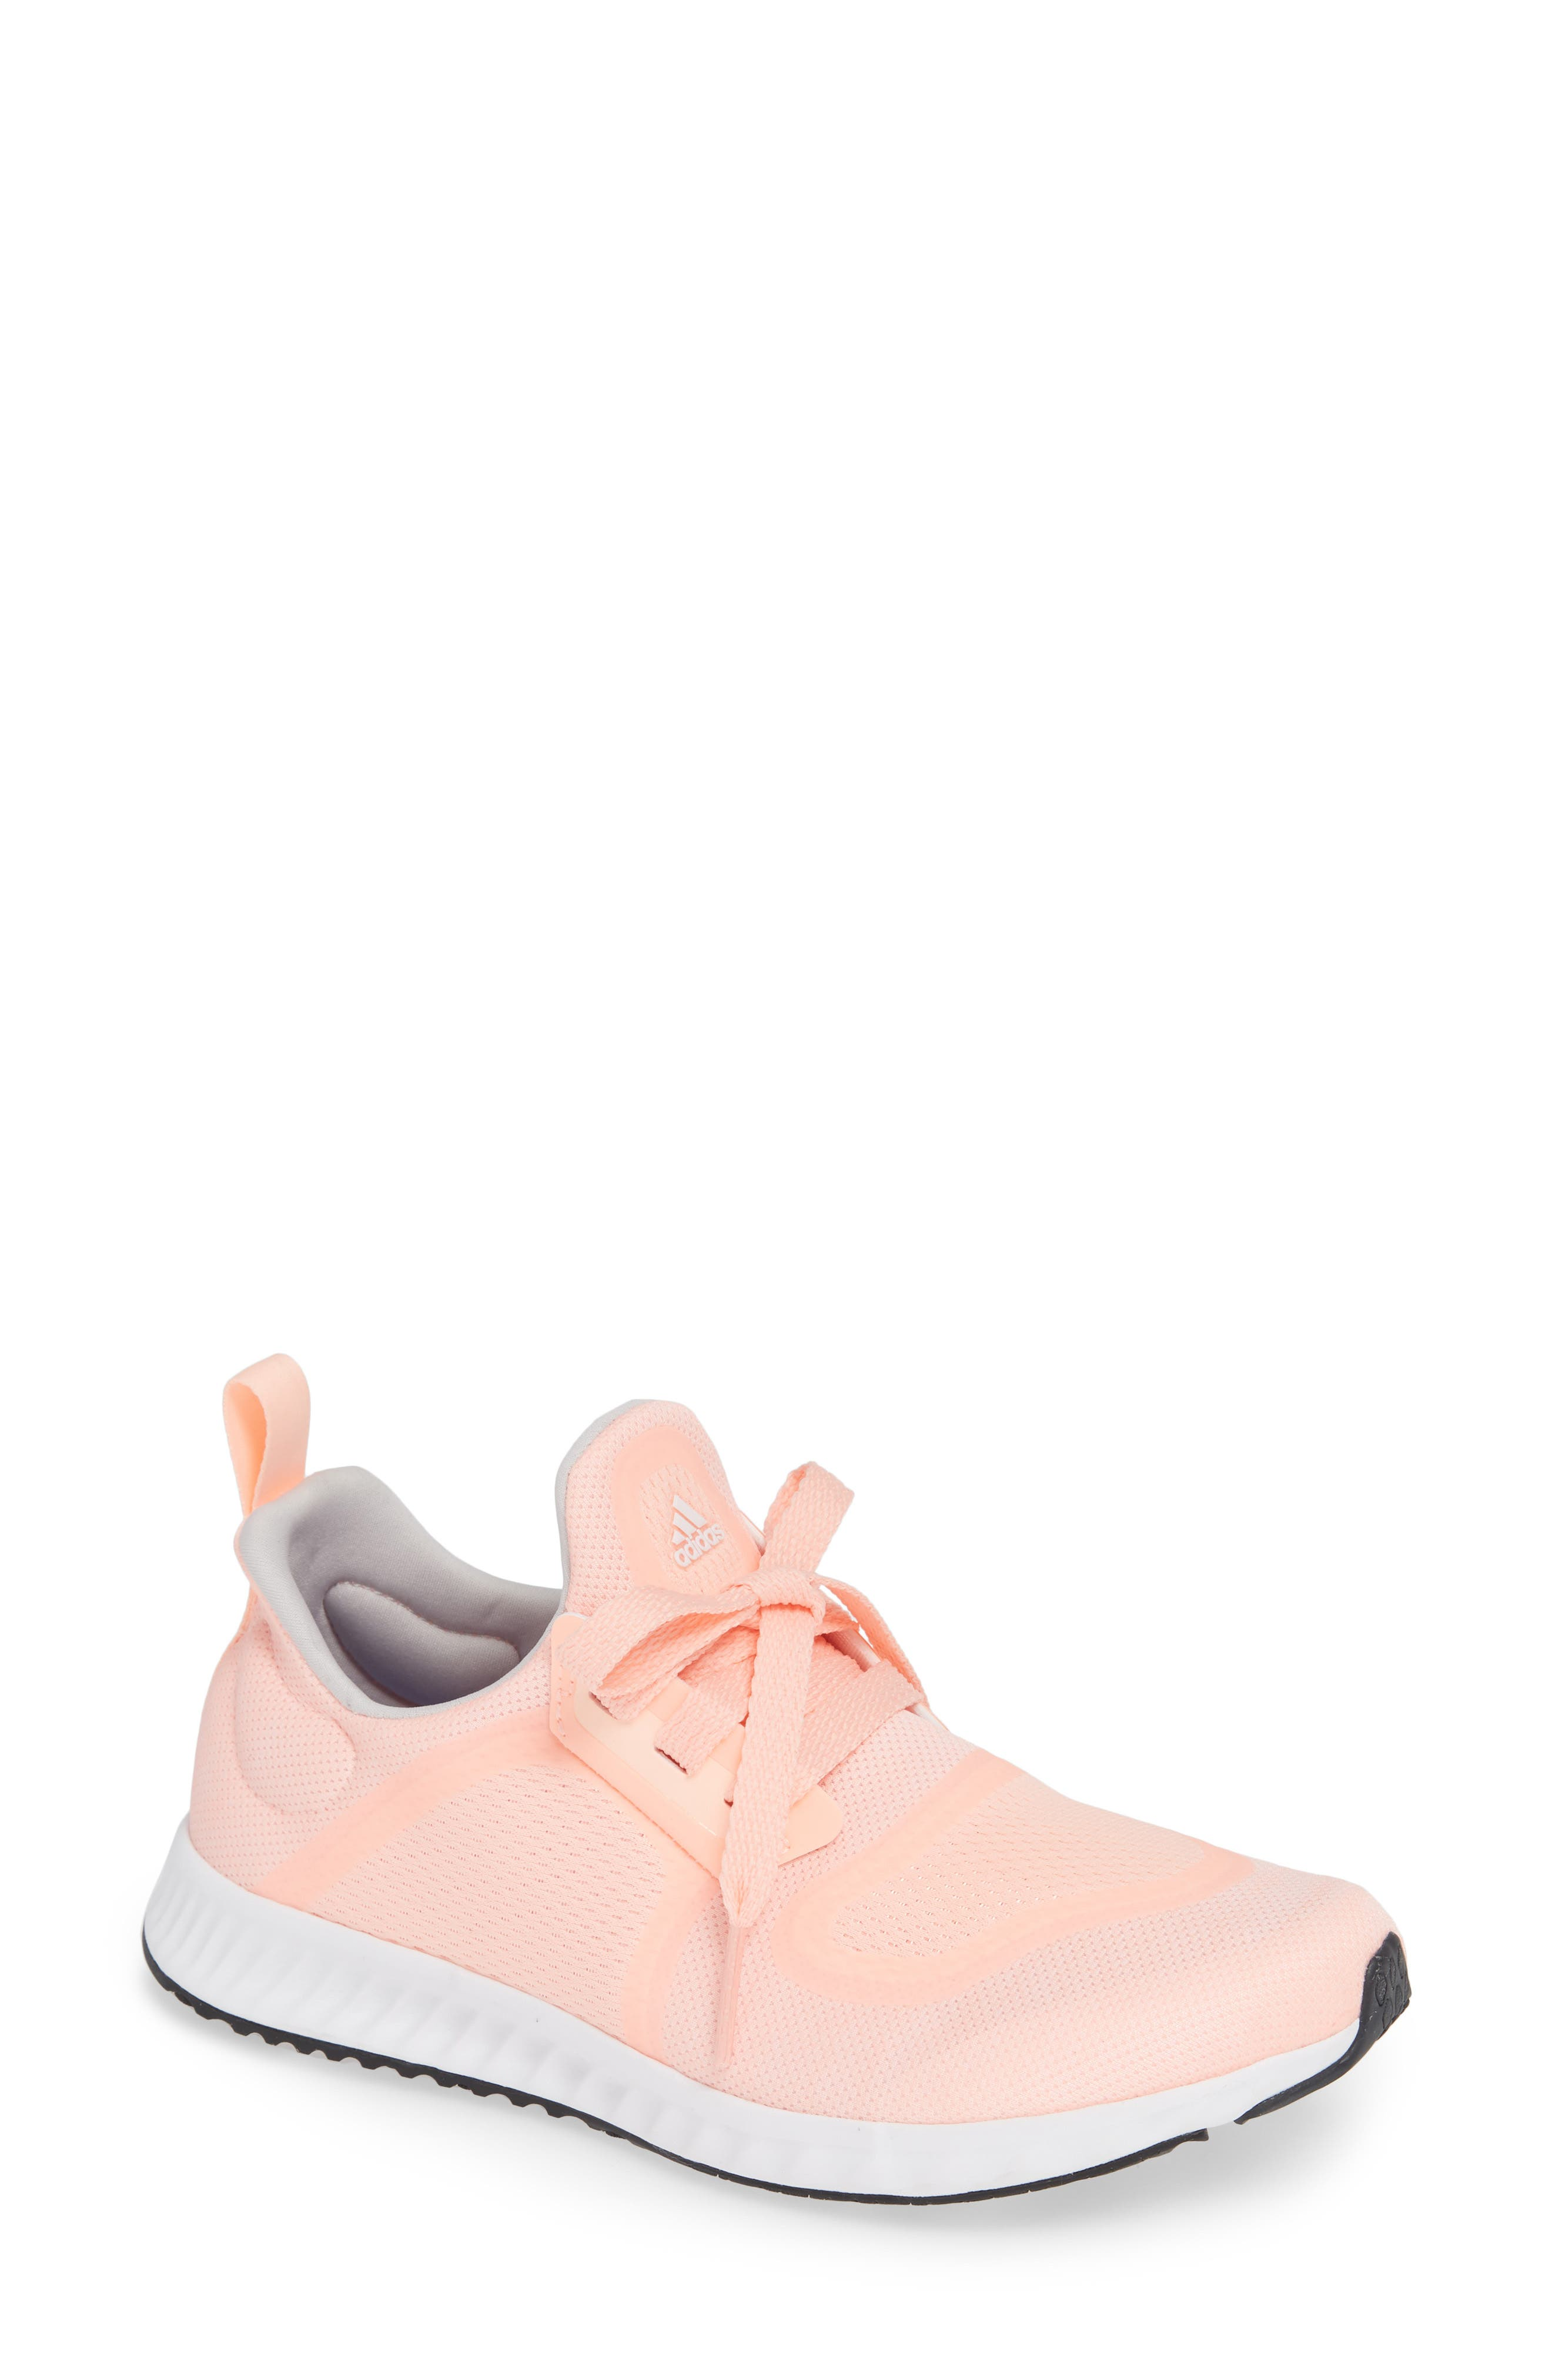 Edge Lux Clima Running Shoe,                             Main thumbnail 1, color,                             Clear Orange/ White